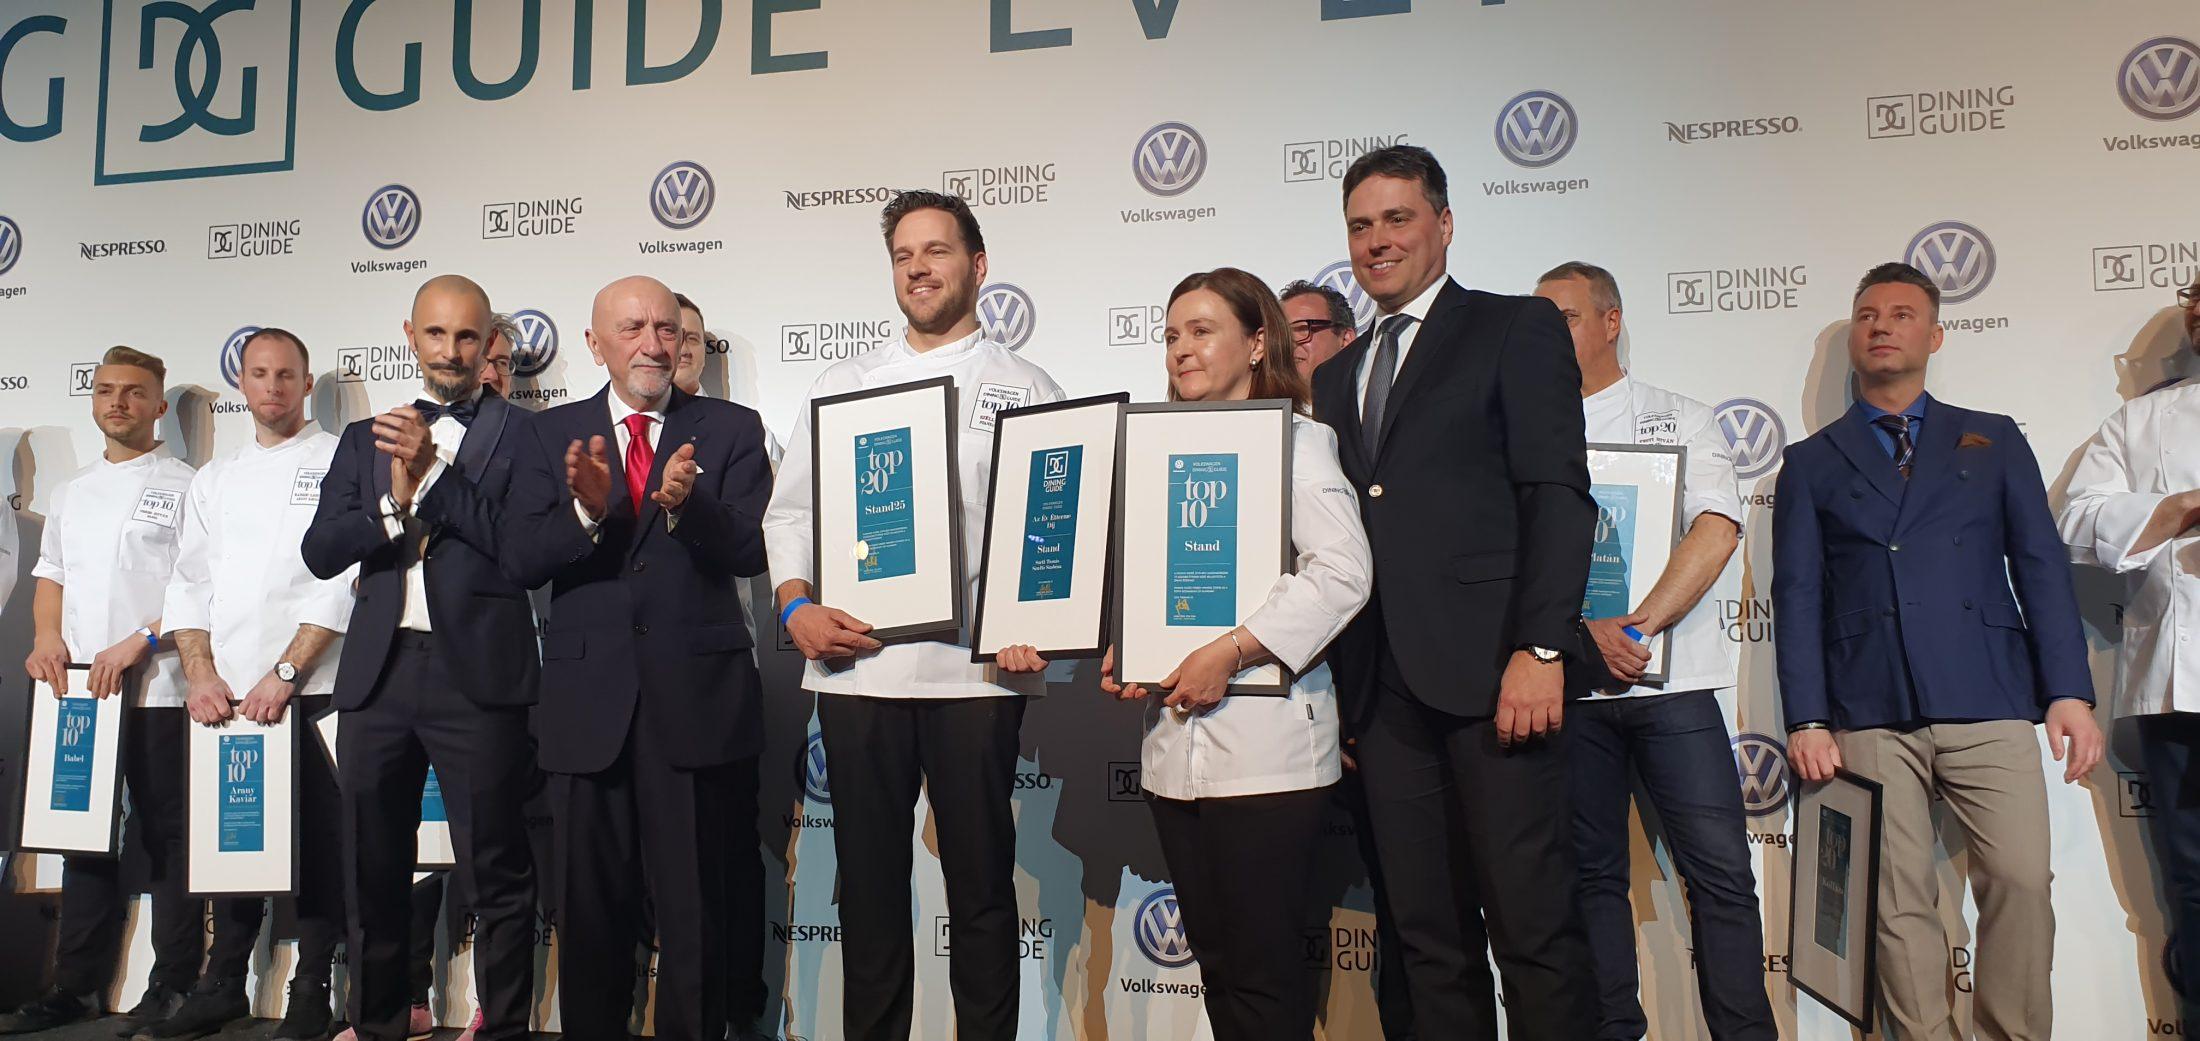 Íme, a Volkswagen-Dining Guide Év Étterme Gála idei eredményei!